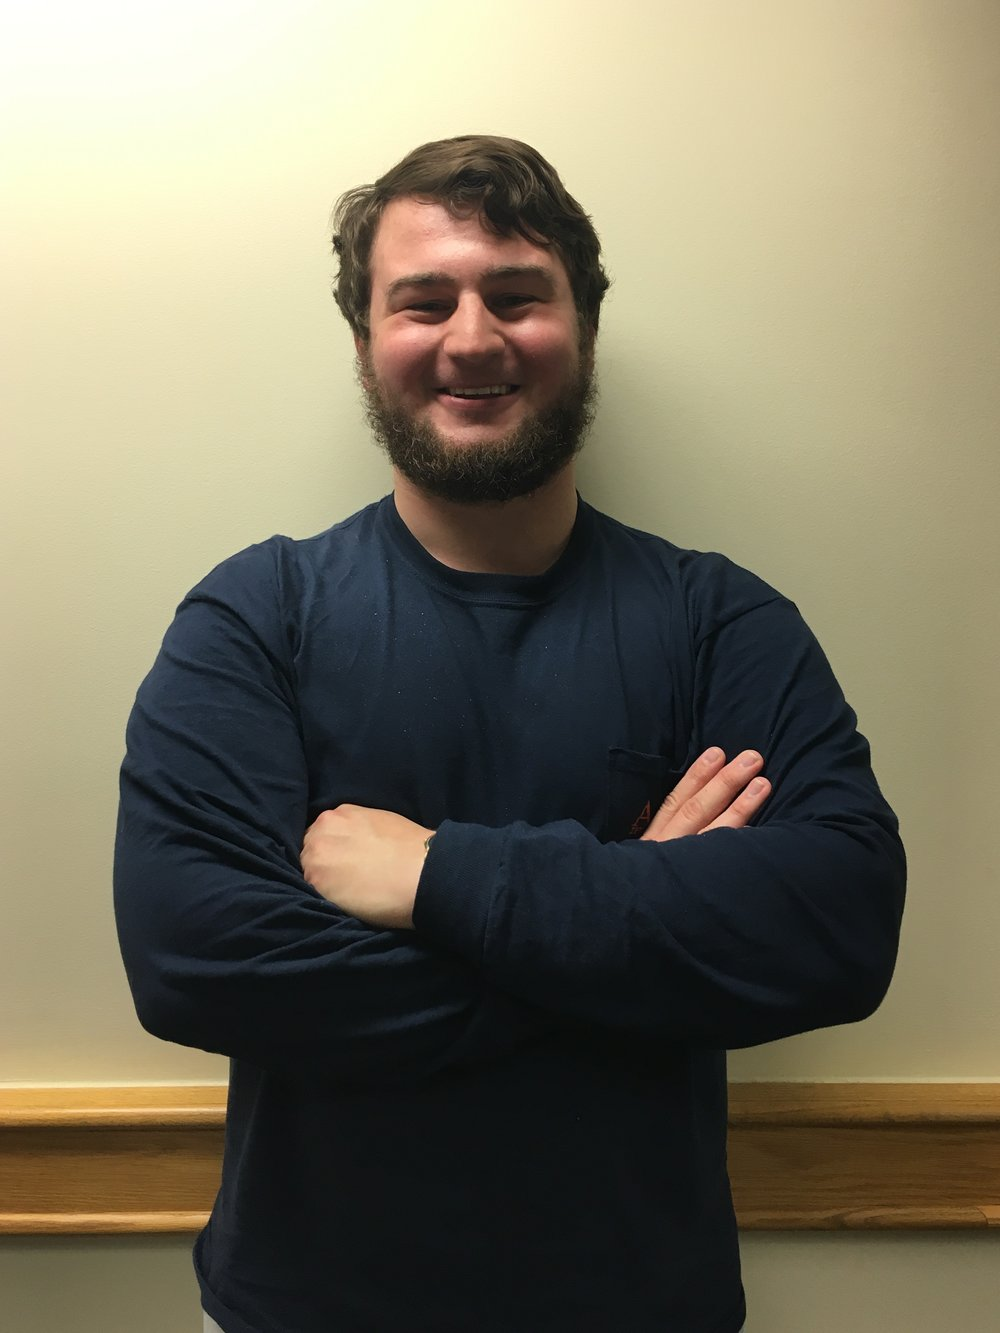 Name: Aaron Ian Rubenstein   Hometown:  Staten Island, NY   Fraternal Class:  Epsilon   Major: Human Physiology, Pre-med